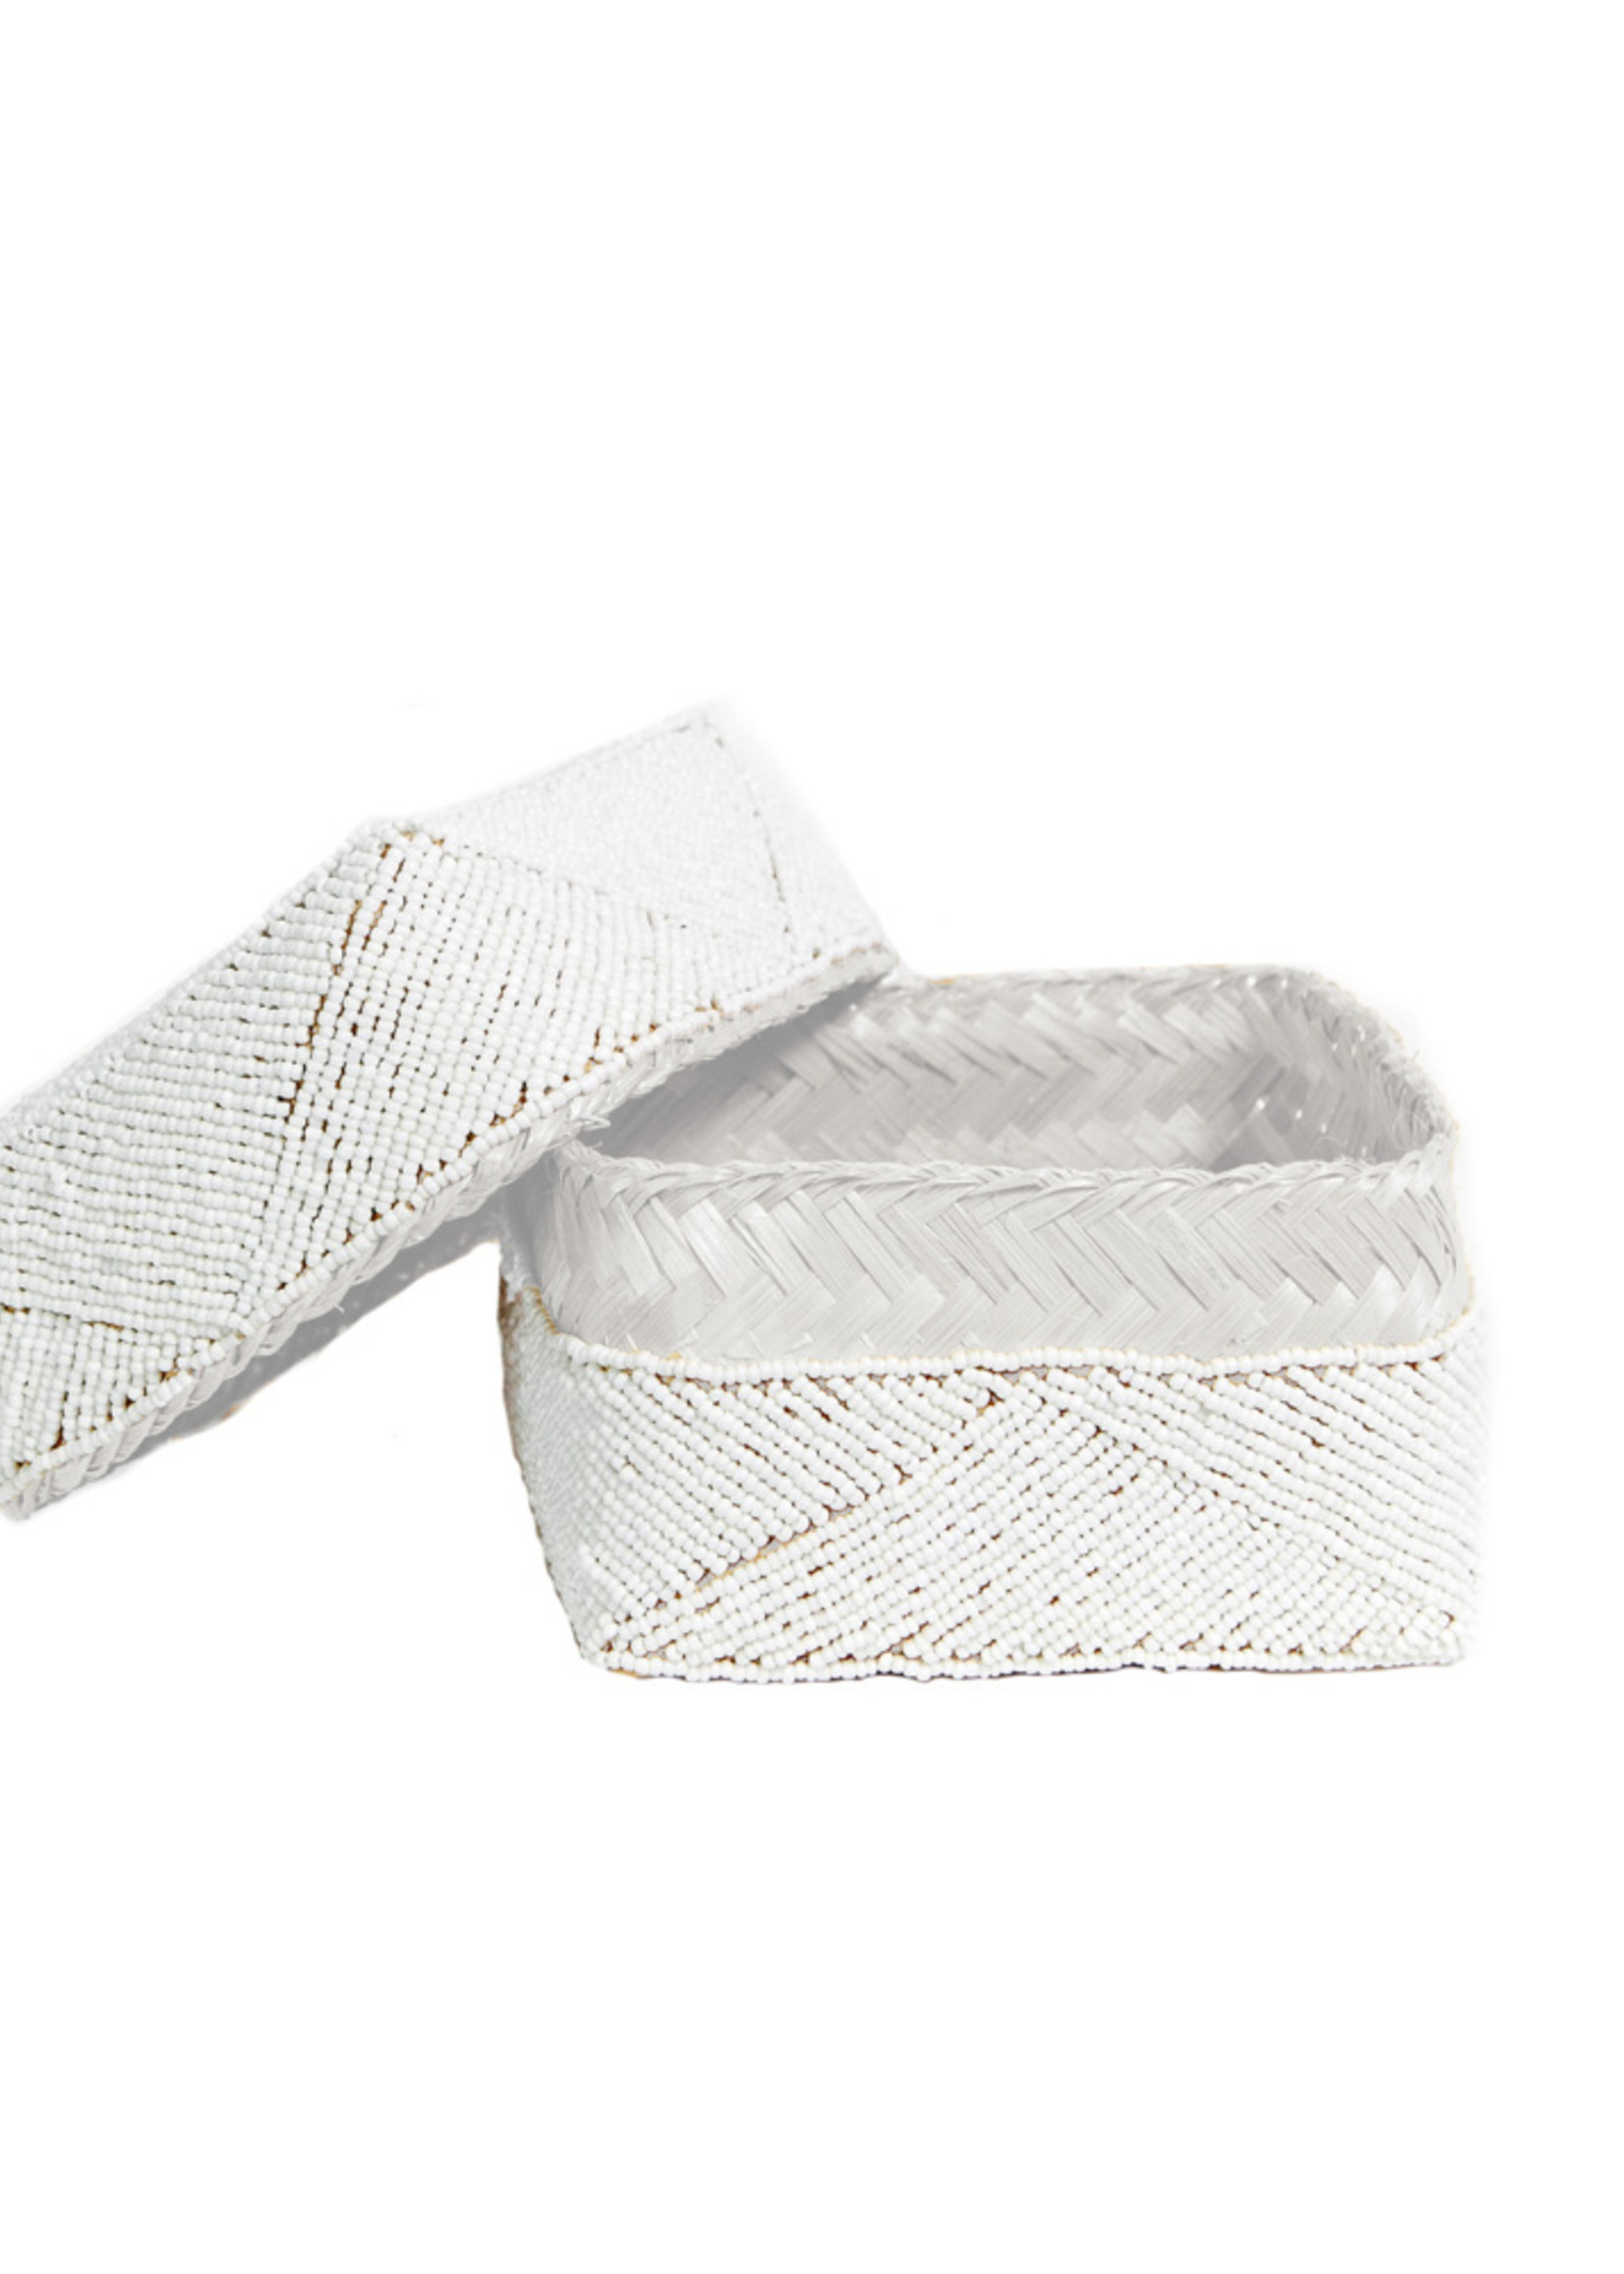 The Beaded Basket - White - S